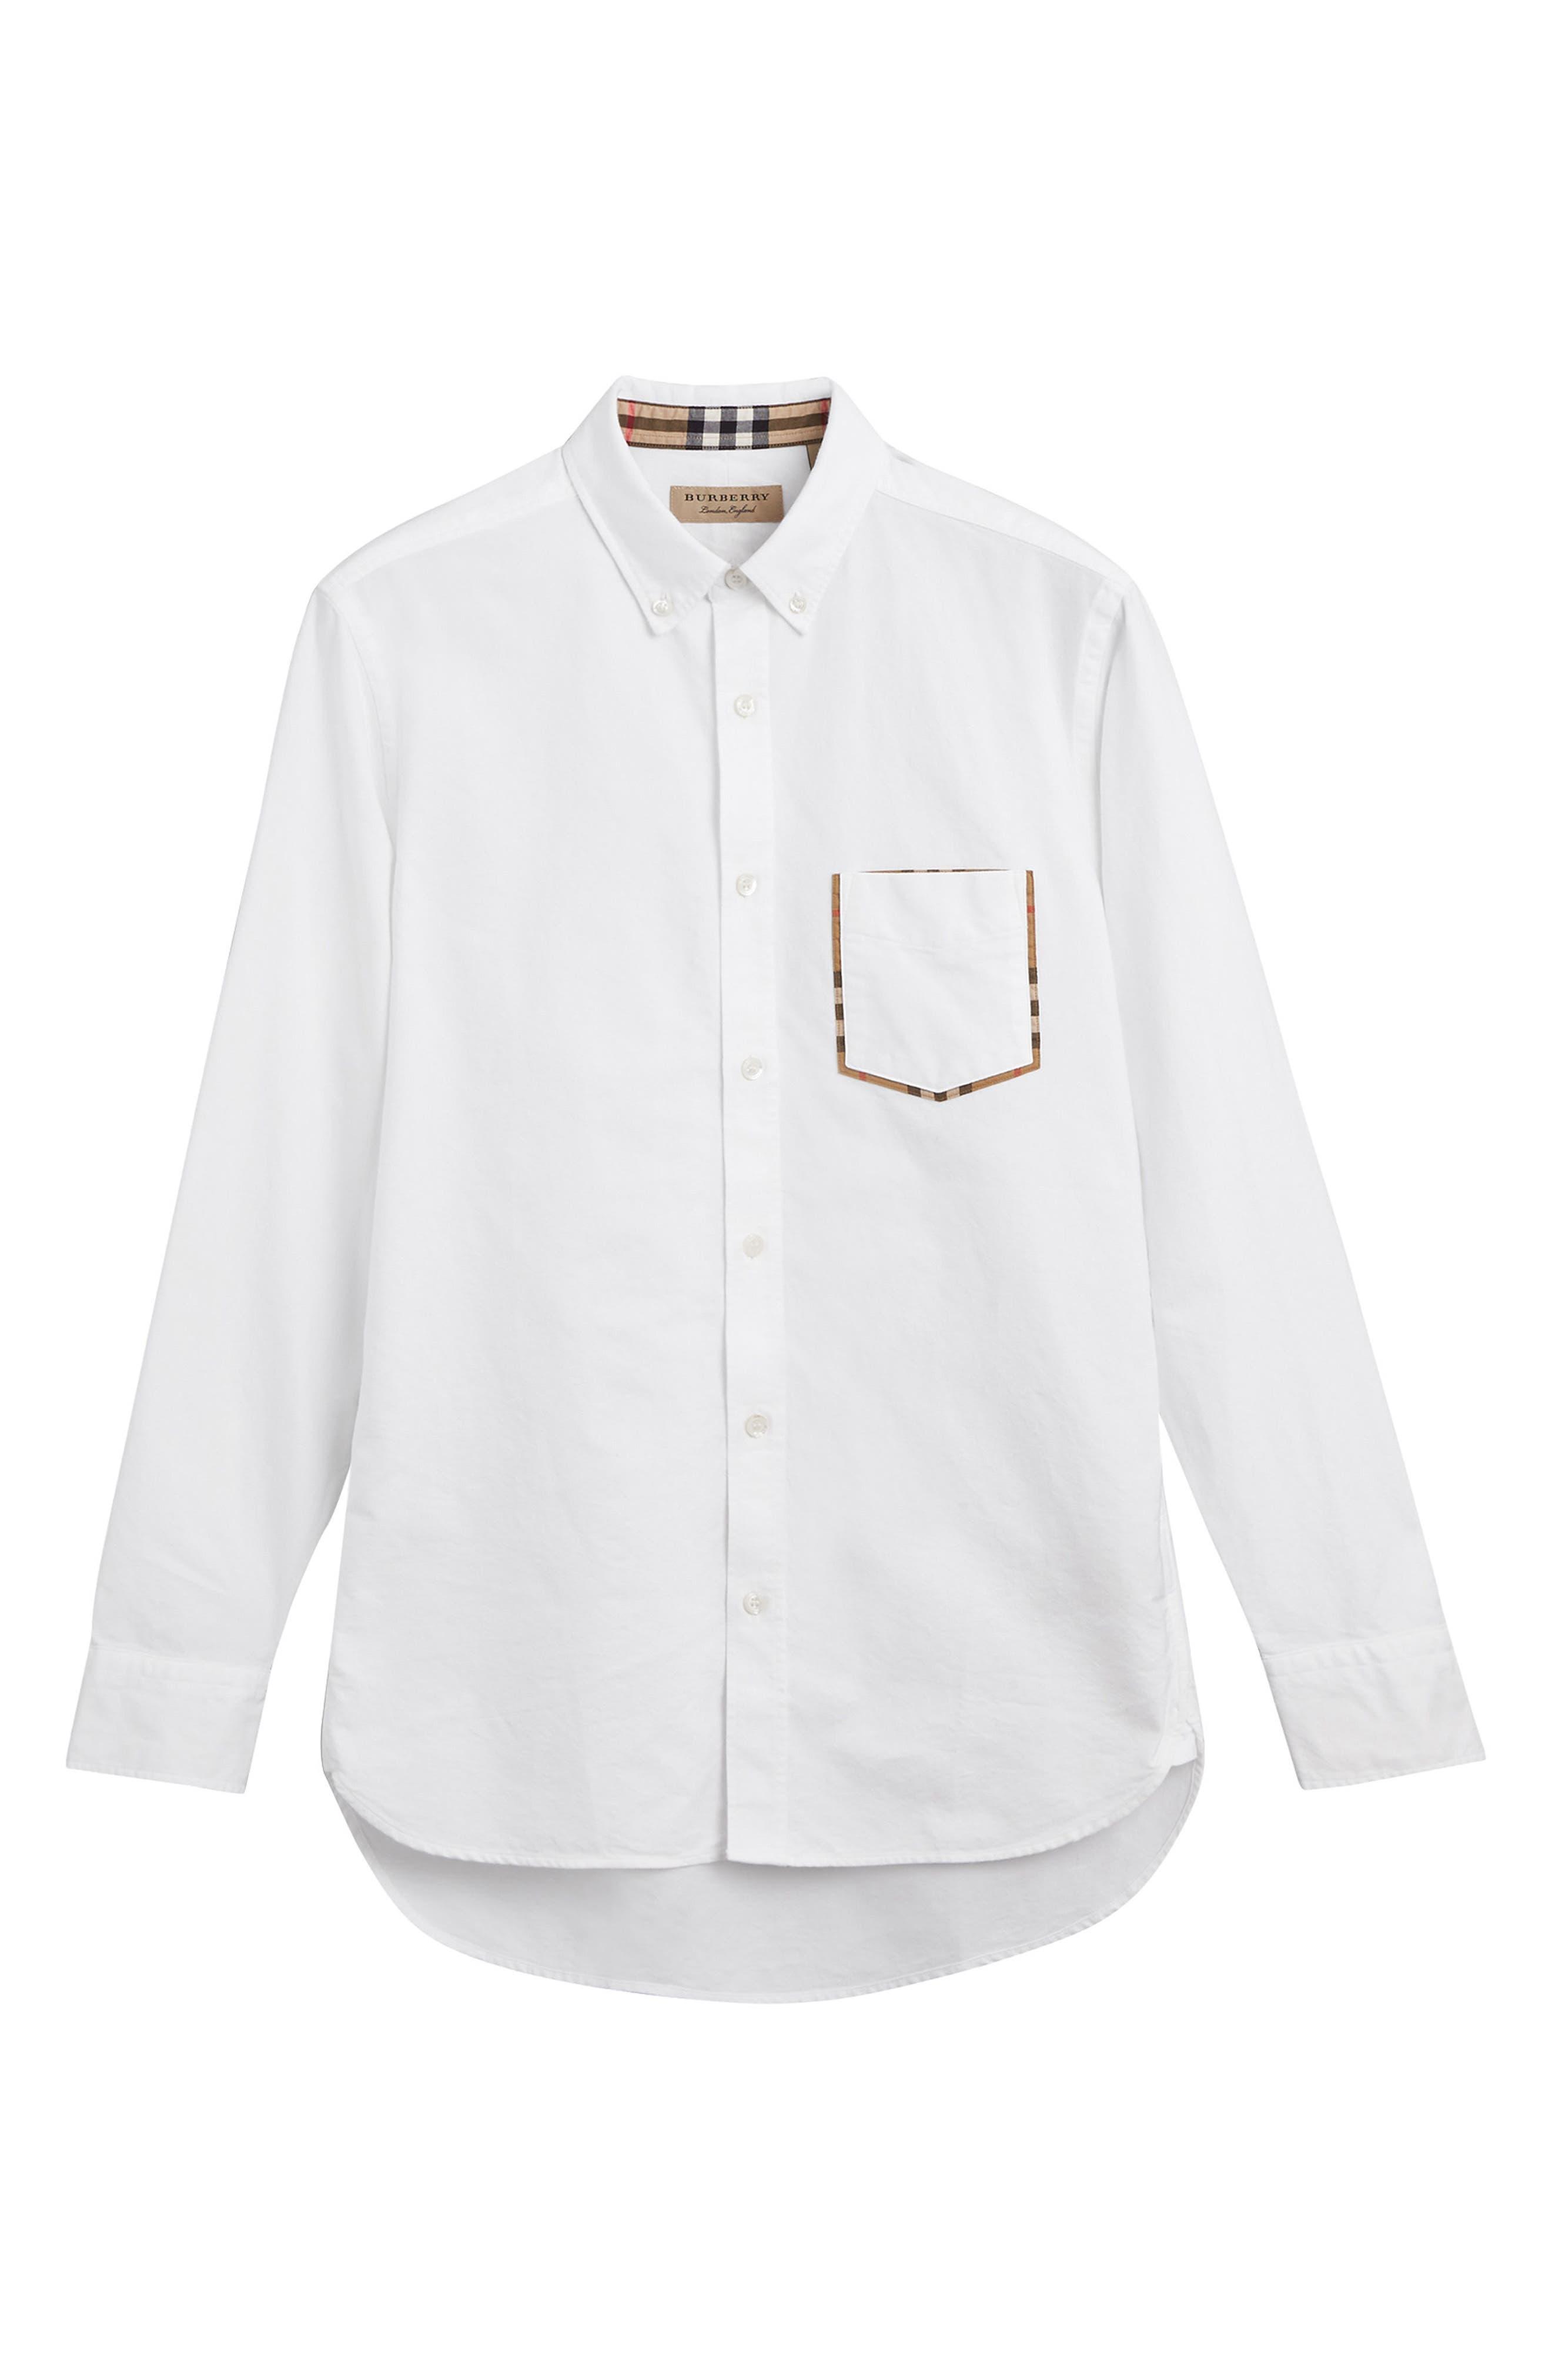 BURBERRY,                             Harry Check Trim Sport Shirt,                             Alternate thumbnail 5, color,                             WHITE